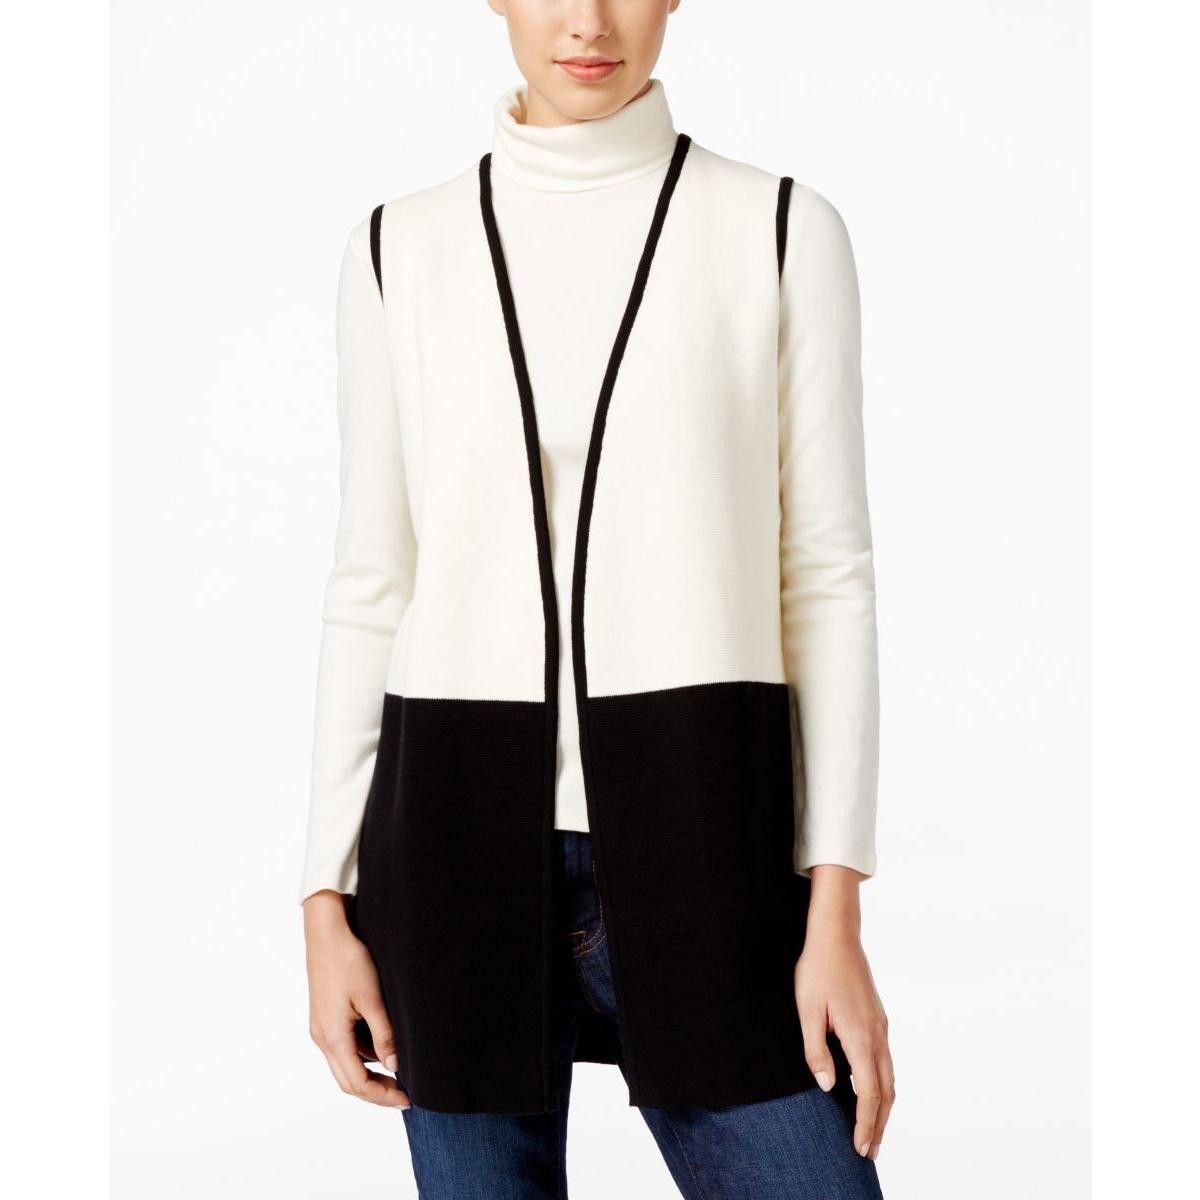 Charter Club Womens Colorblock Contrast Trim Cardigan Sweater